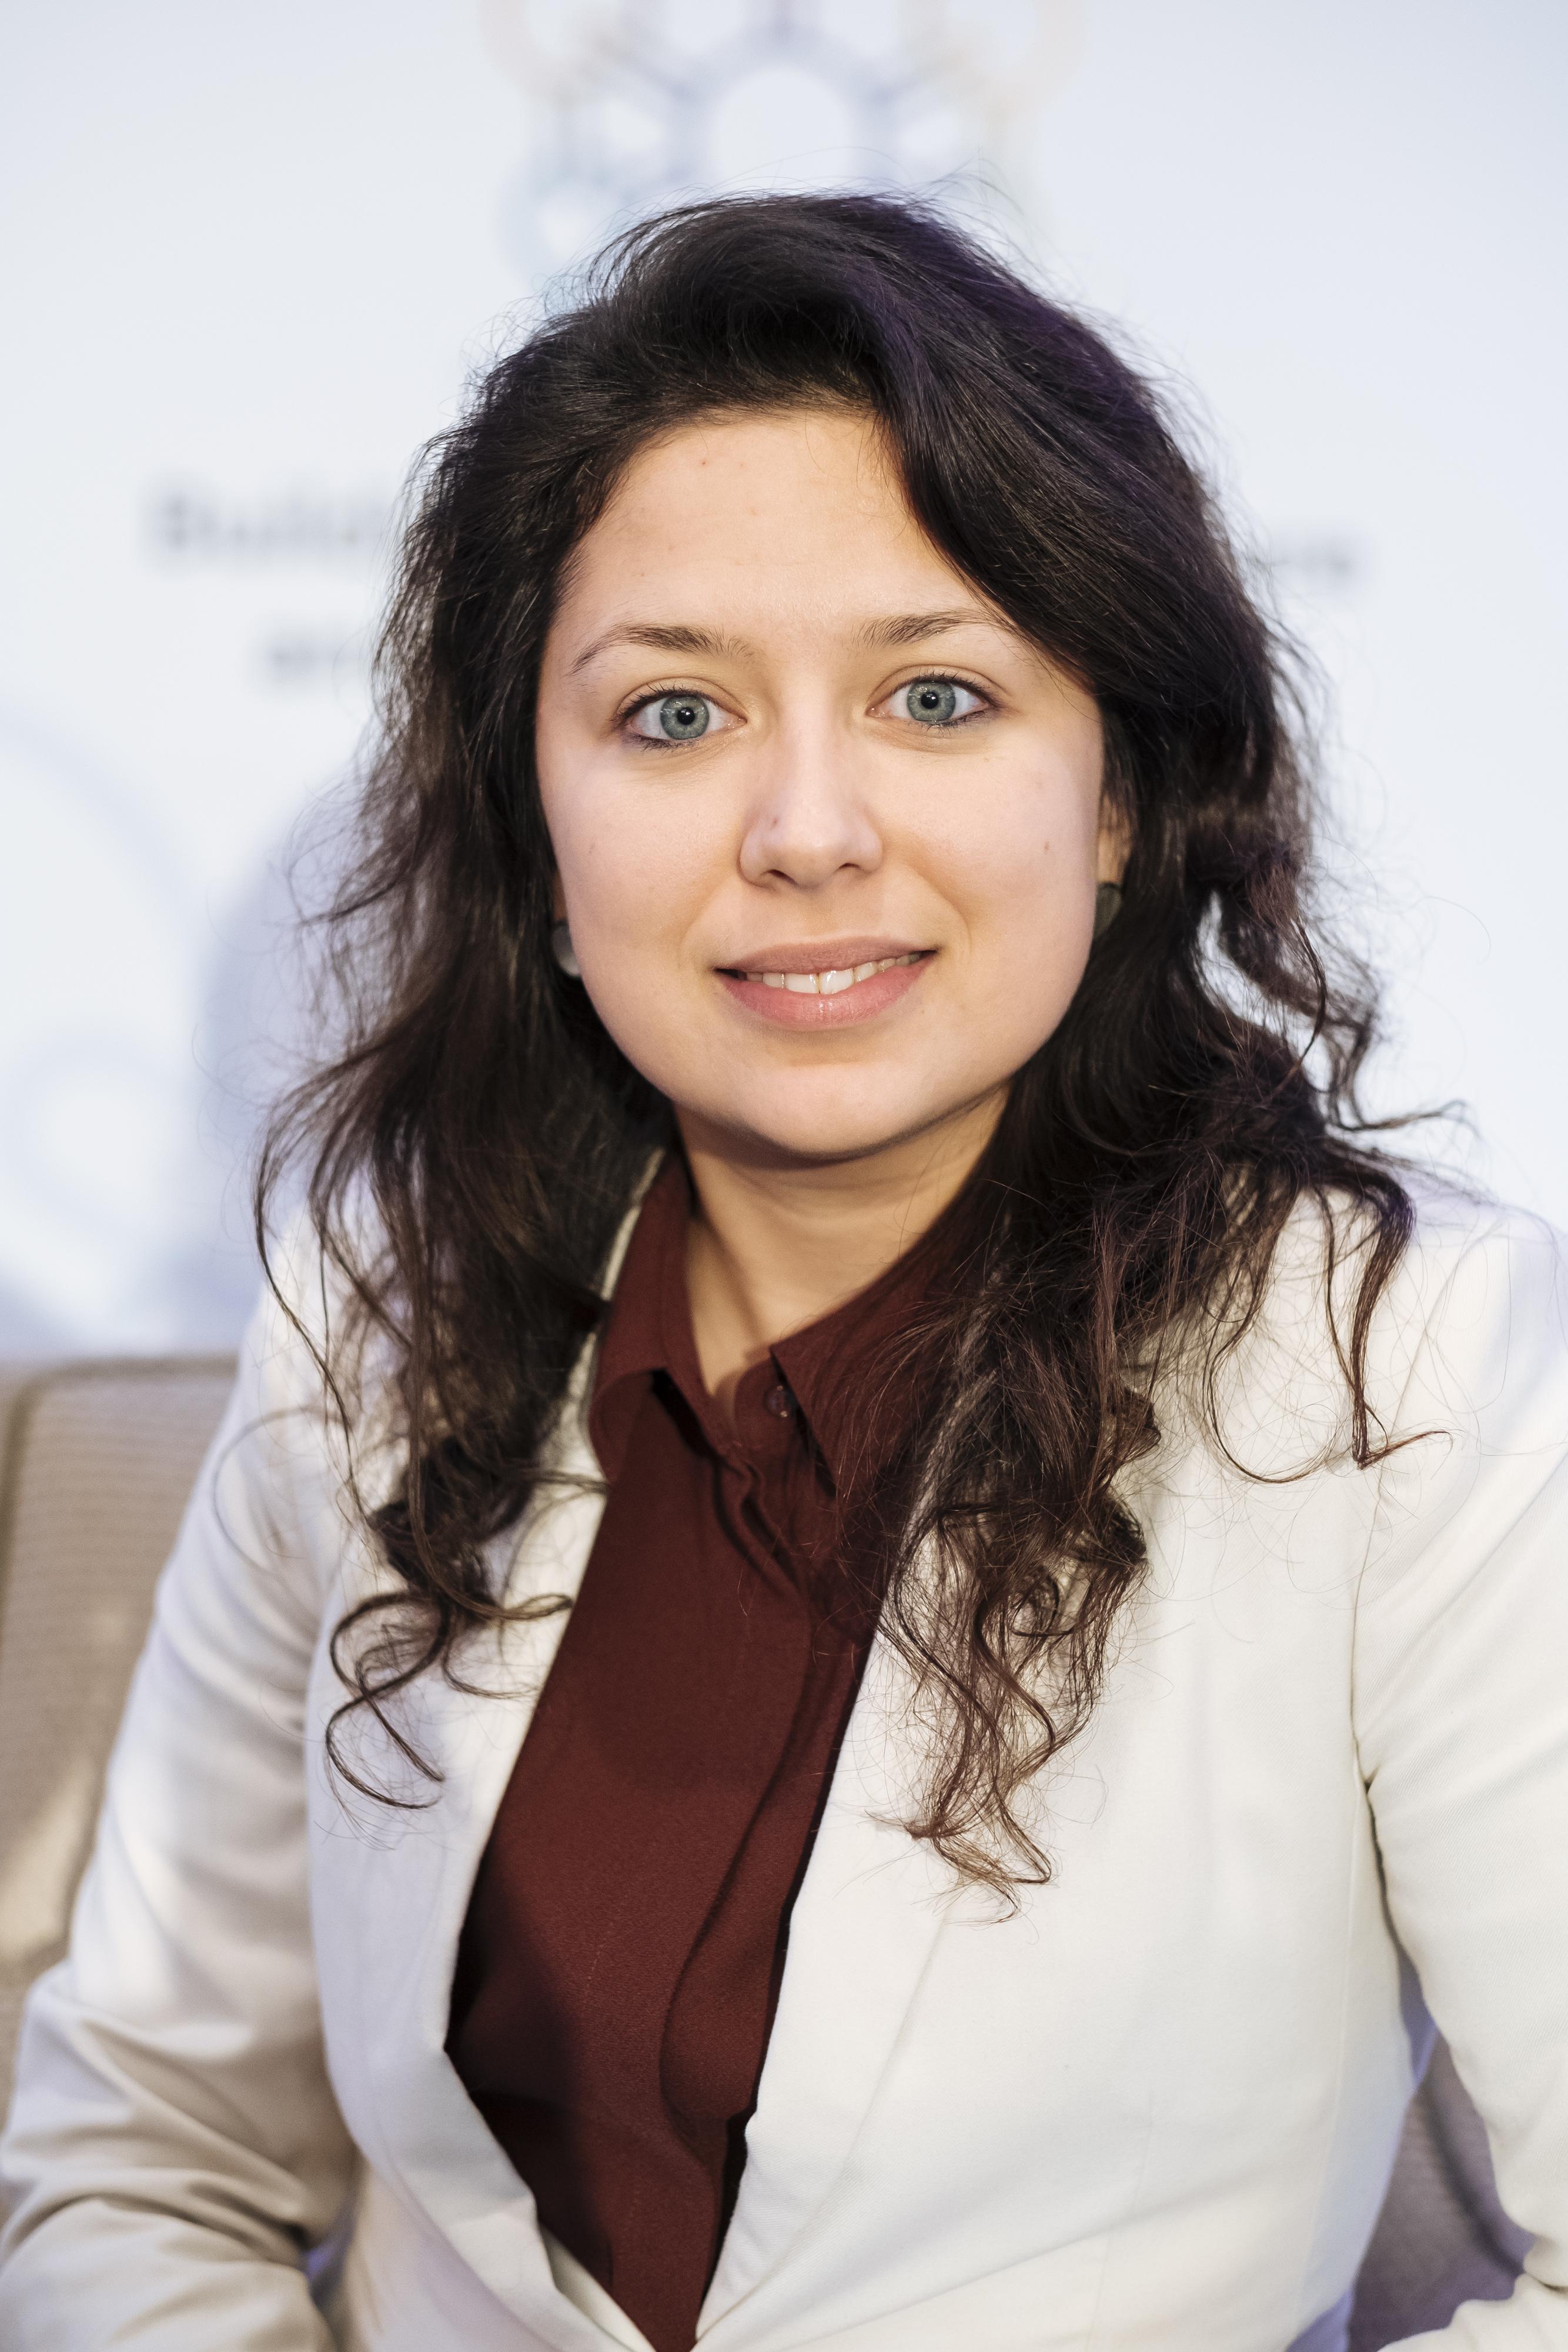 Darya Mustafayeva